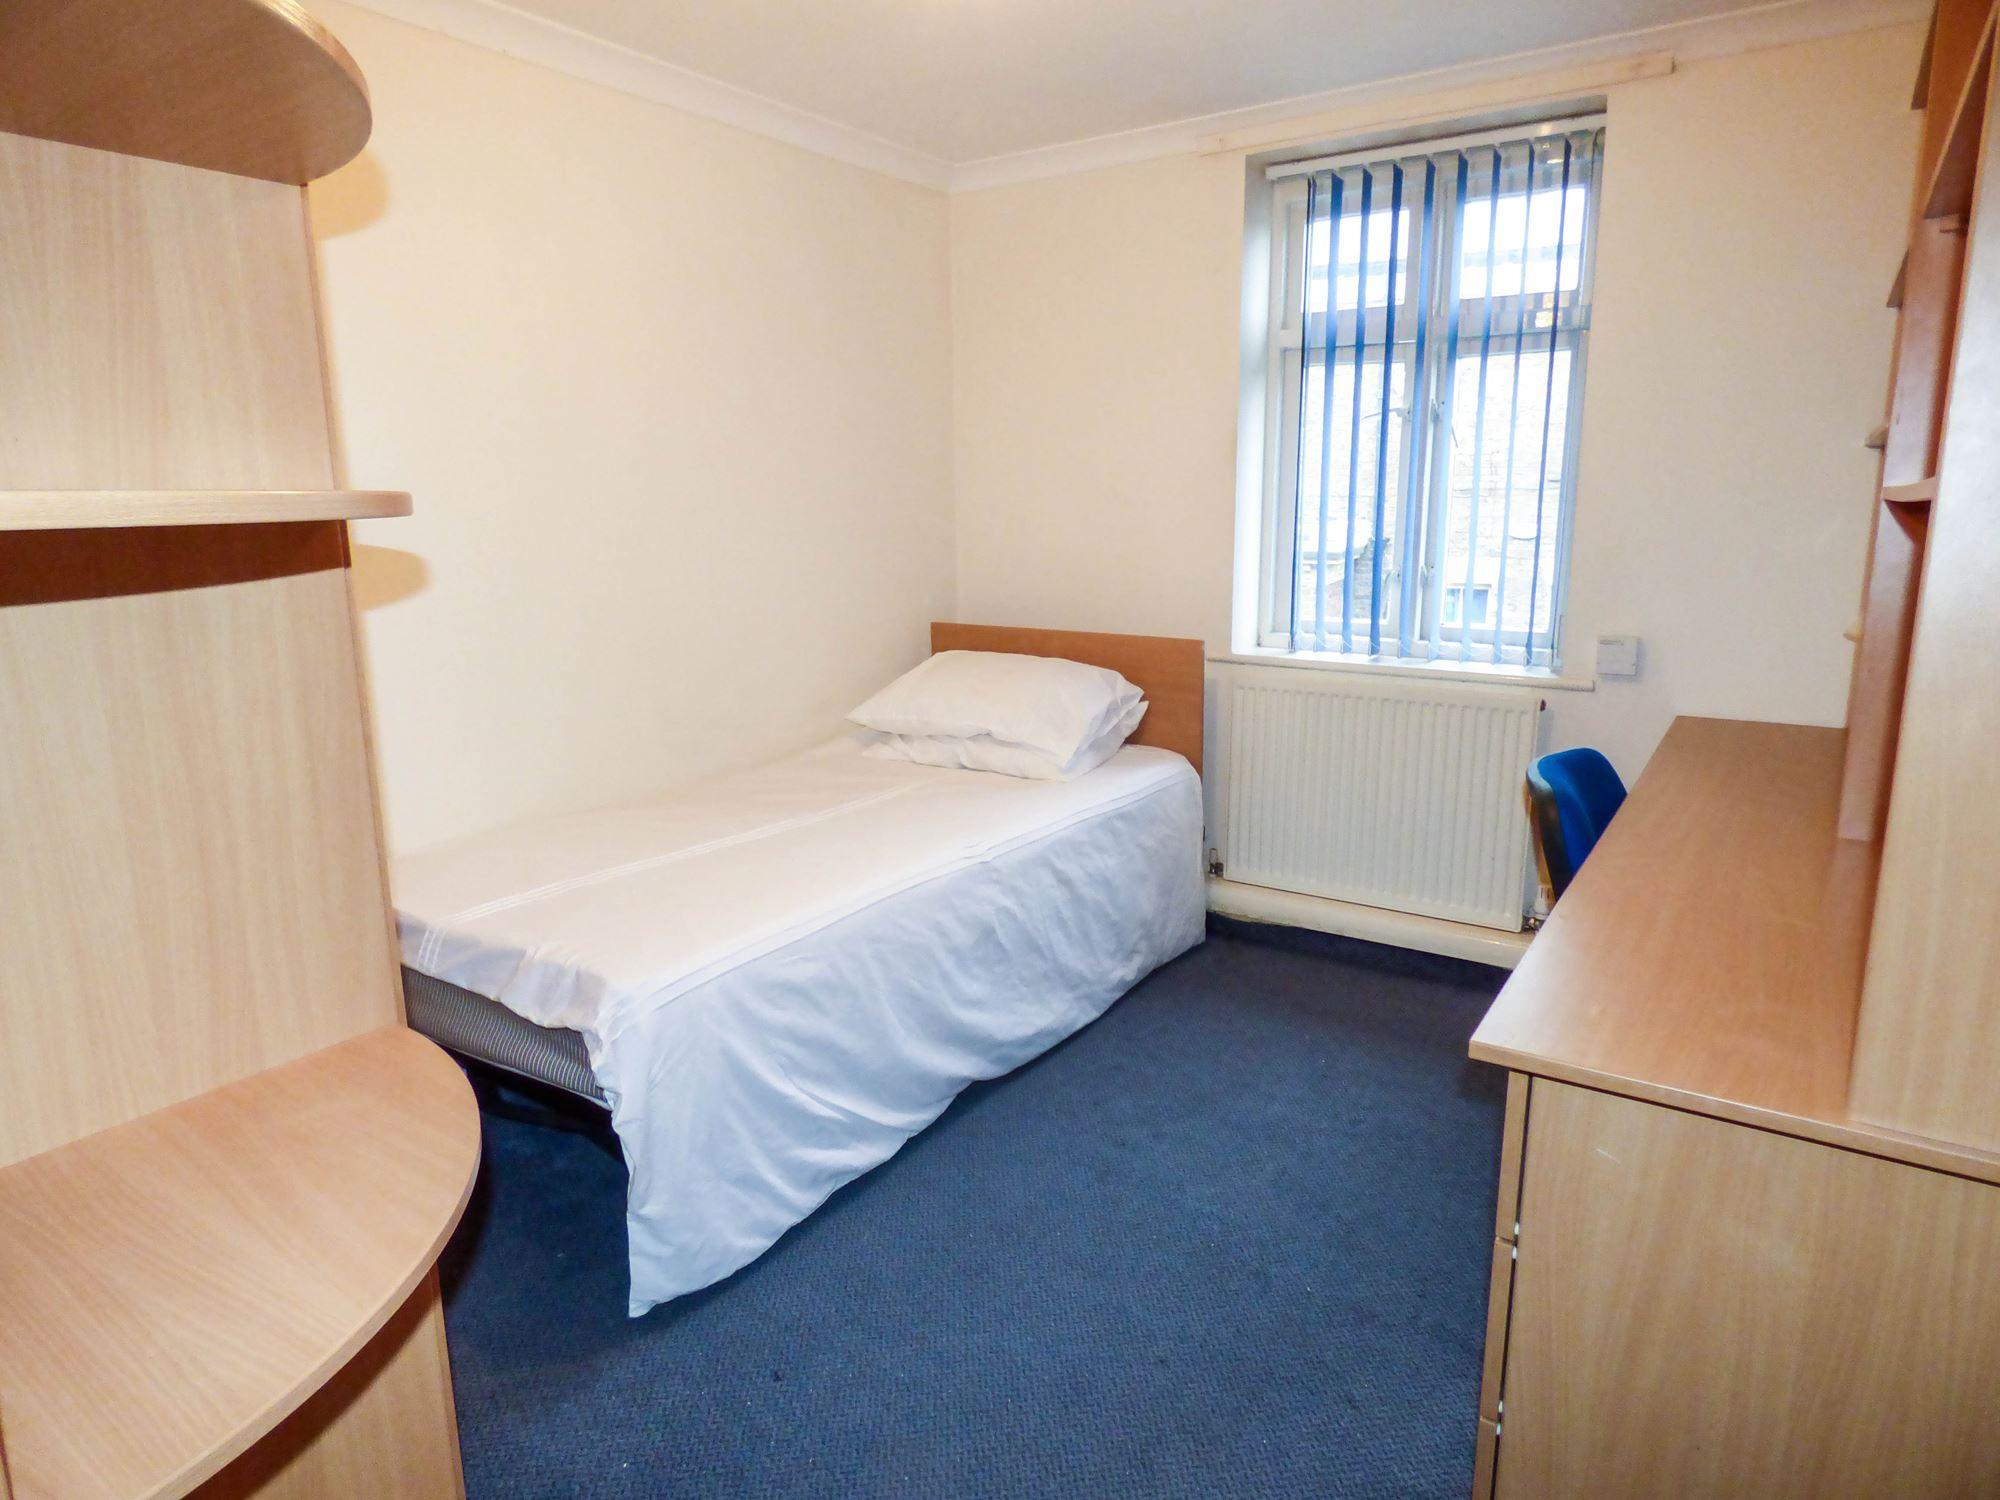 1 Bedroom Flat To Rent Tunstall Road Sunderland Sr Sr2 7as